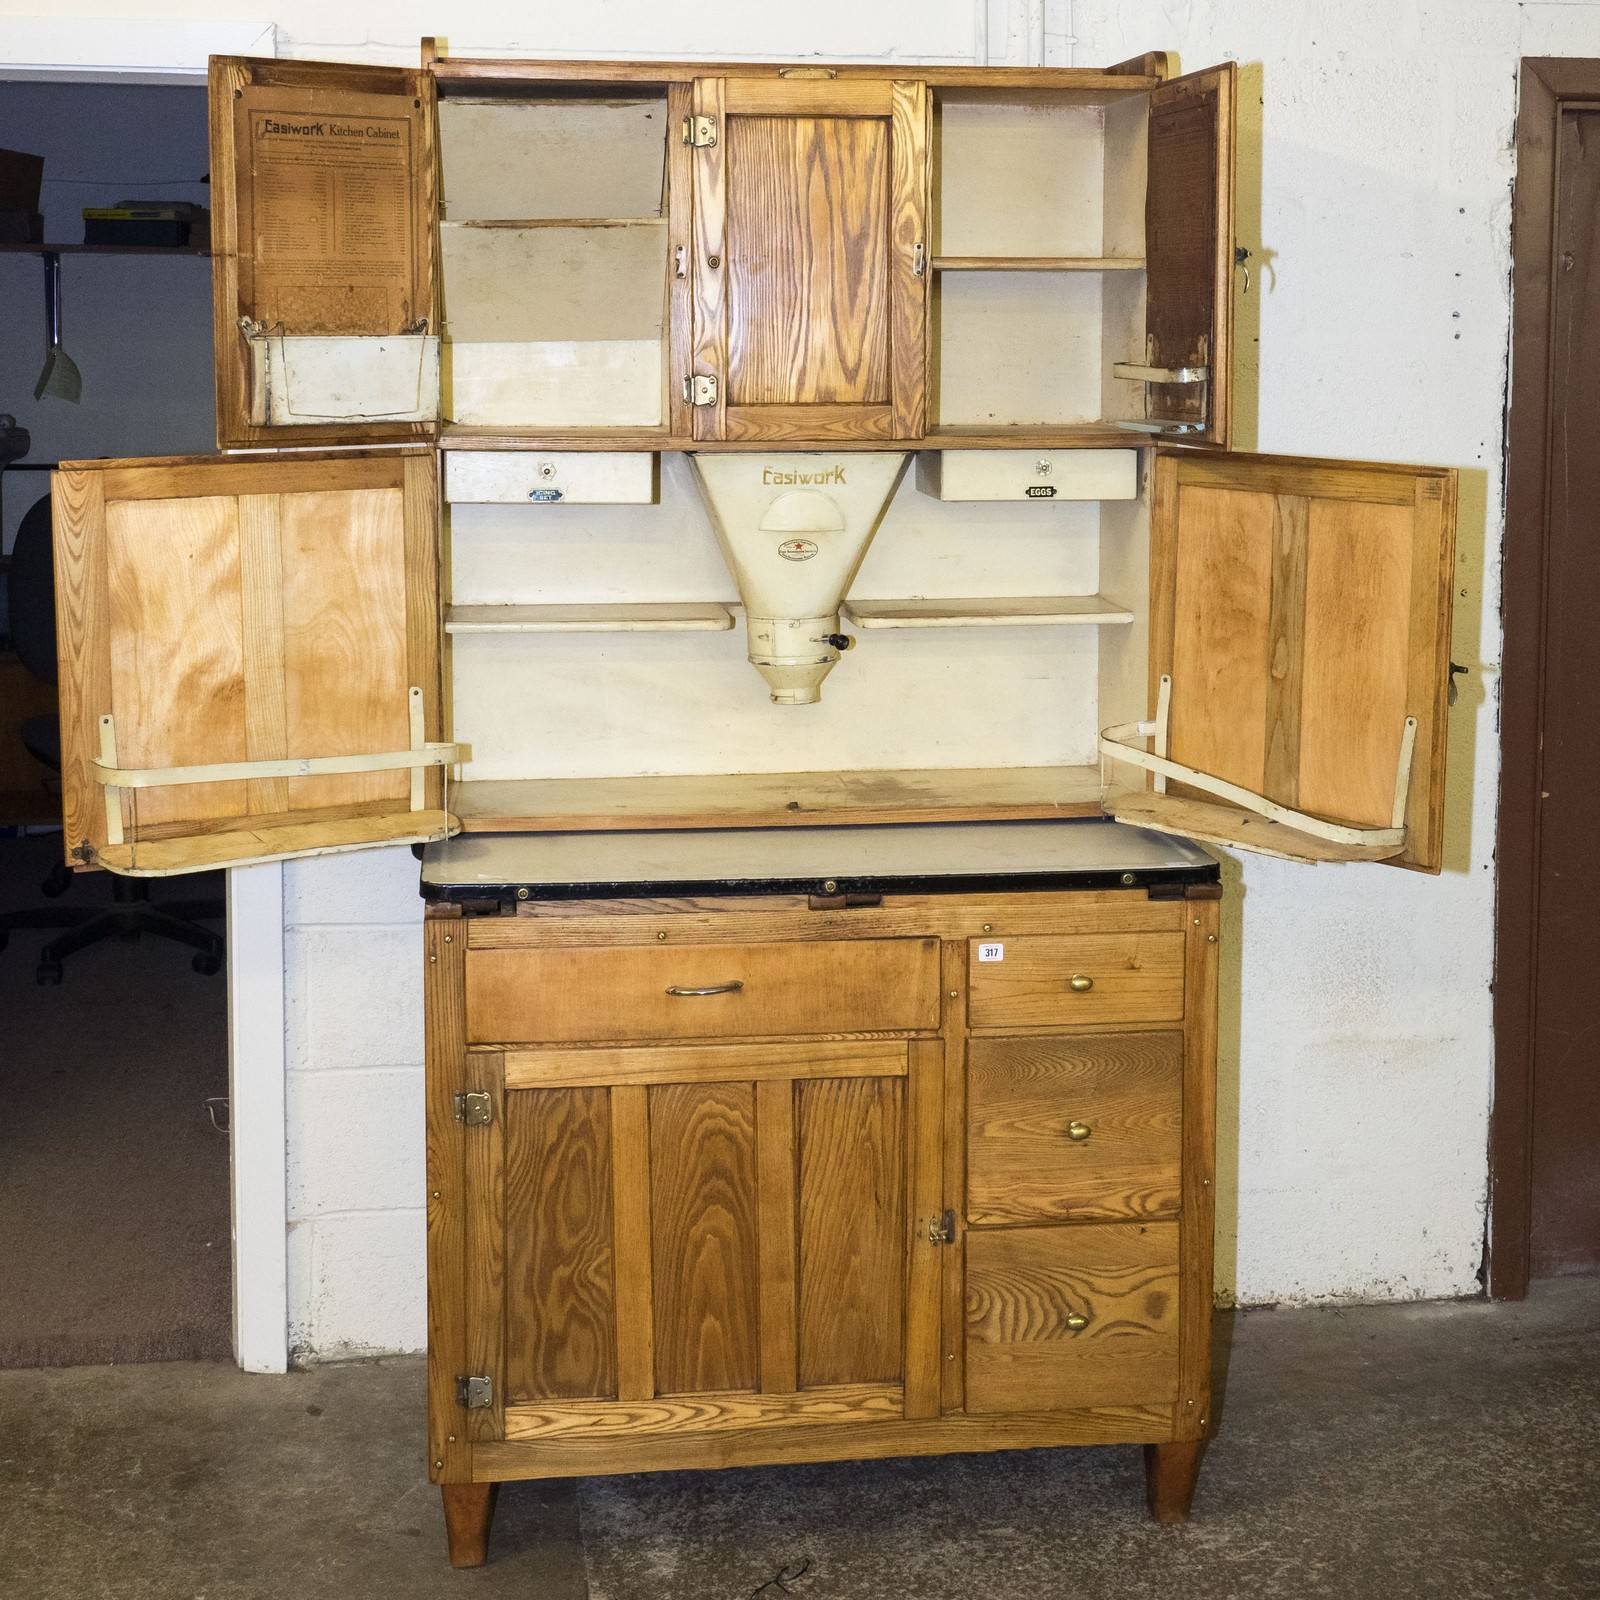 Restored Easiwork 1920s kitchen cabinet with original ...